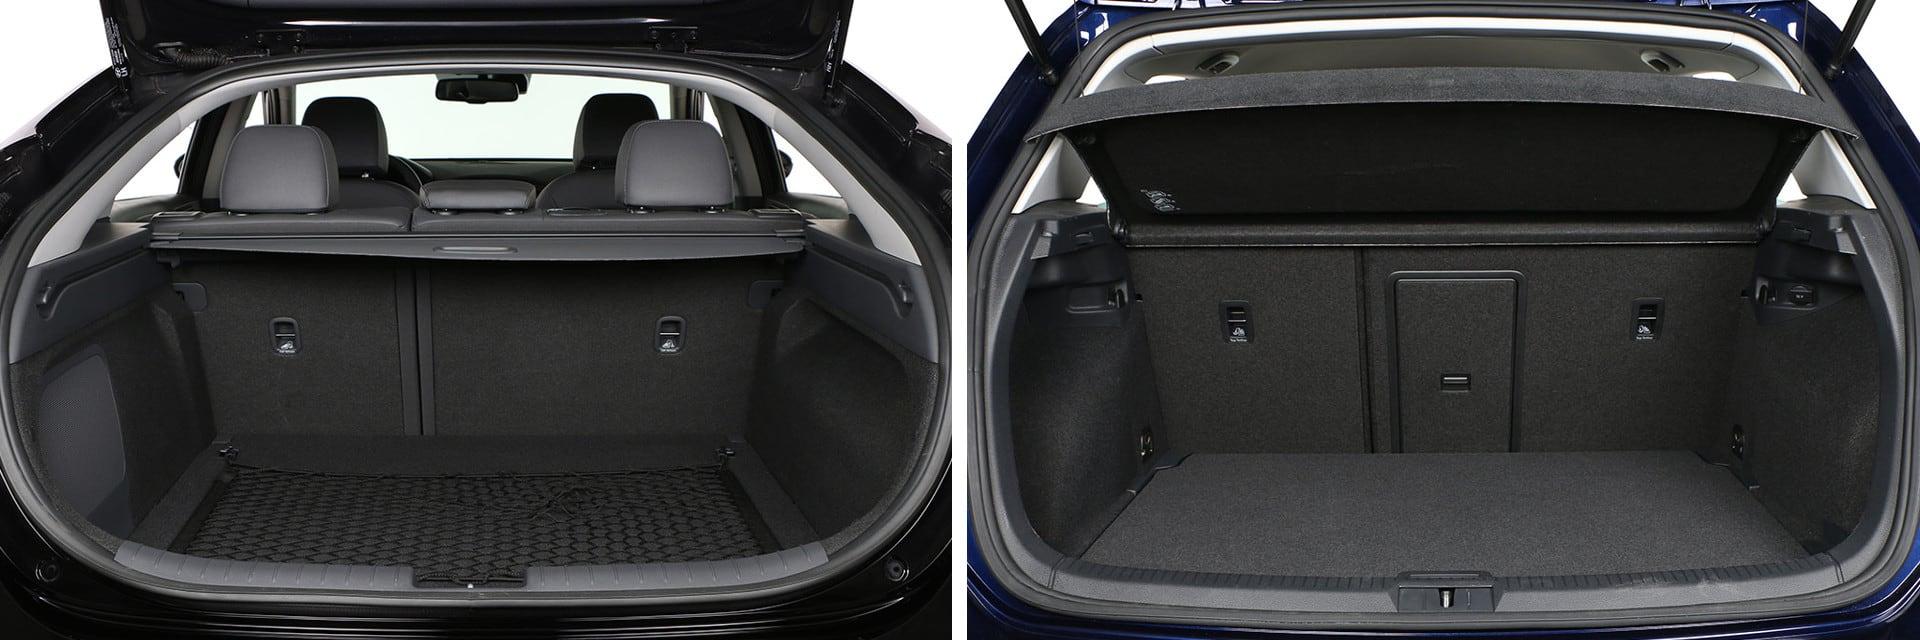 El maletero del IONIQ (izq.) tiene 350 litros, mientras que el del e-Golf (dcha.) tiene 341.